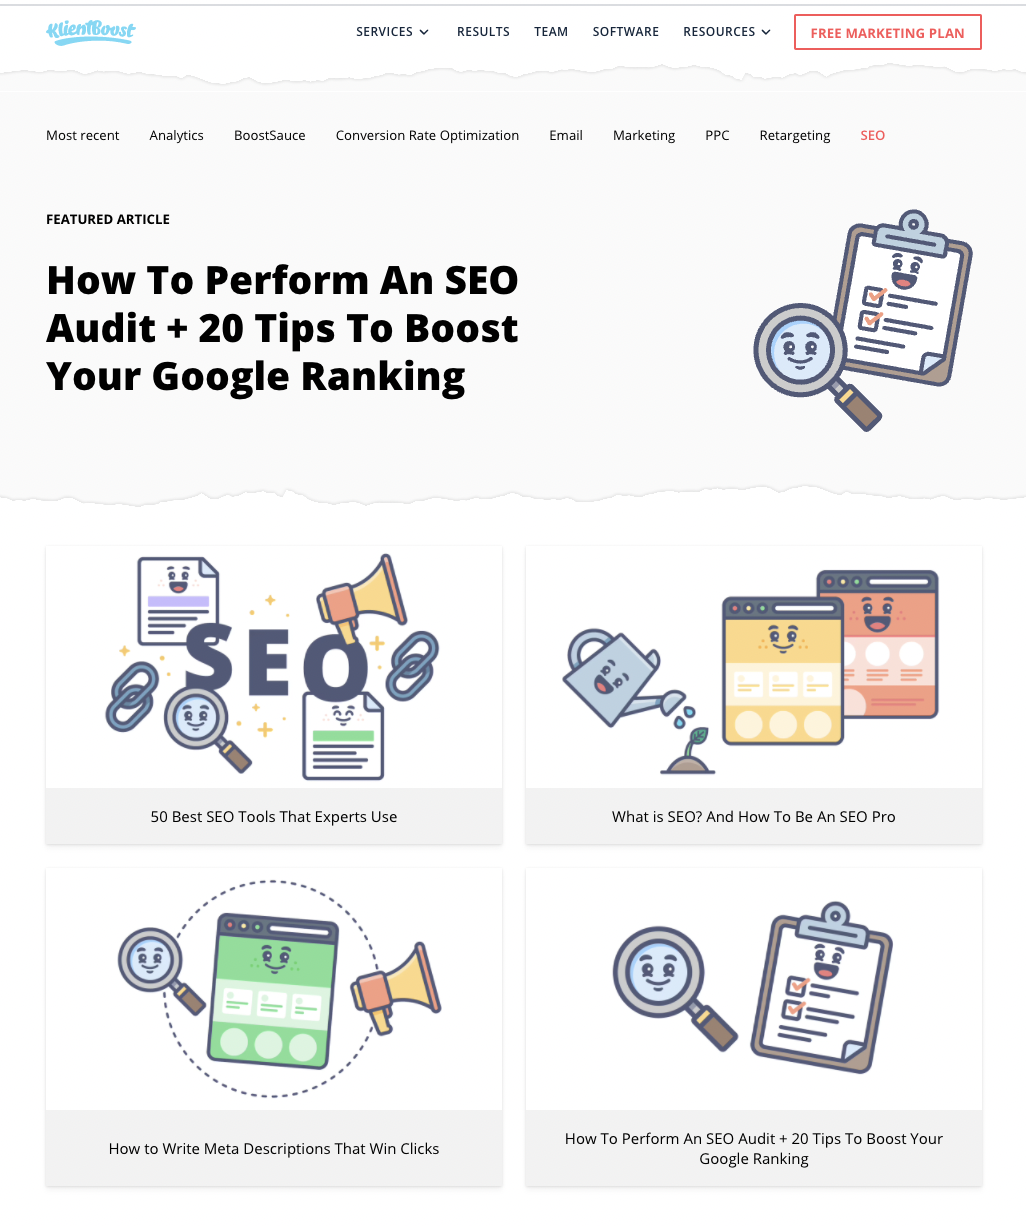 KB arranges all SEO-based articles under the URL: https://klientboost.com/category/seo/